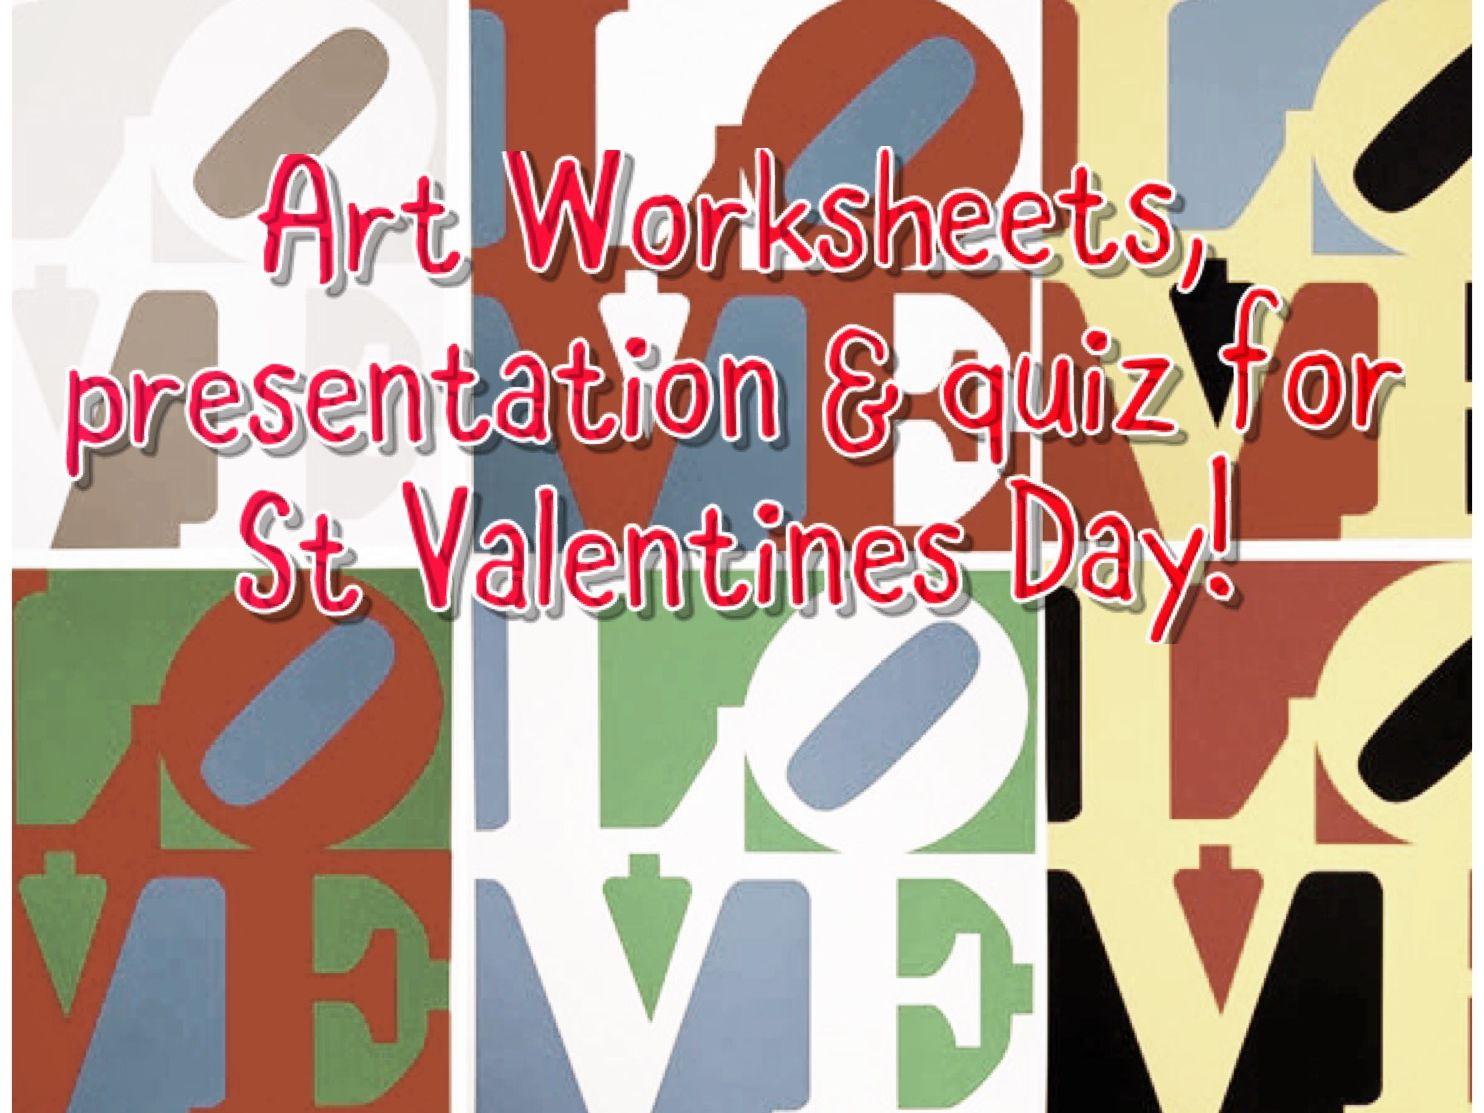 St Valentines Day themed Art worksheets, presentation & Quiz